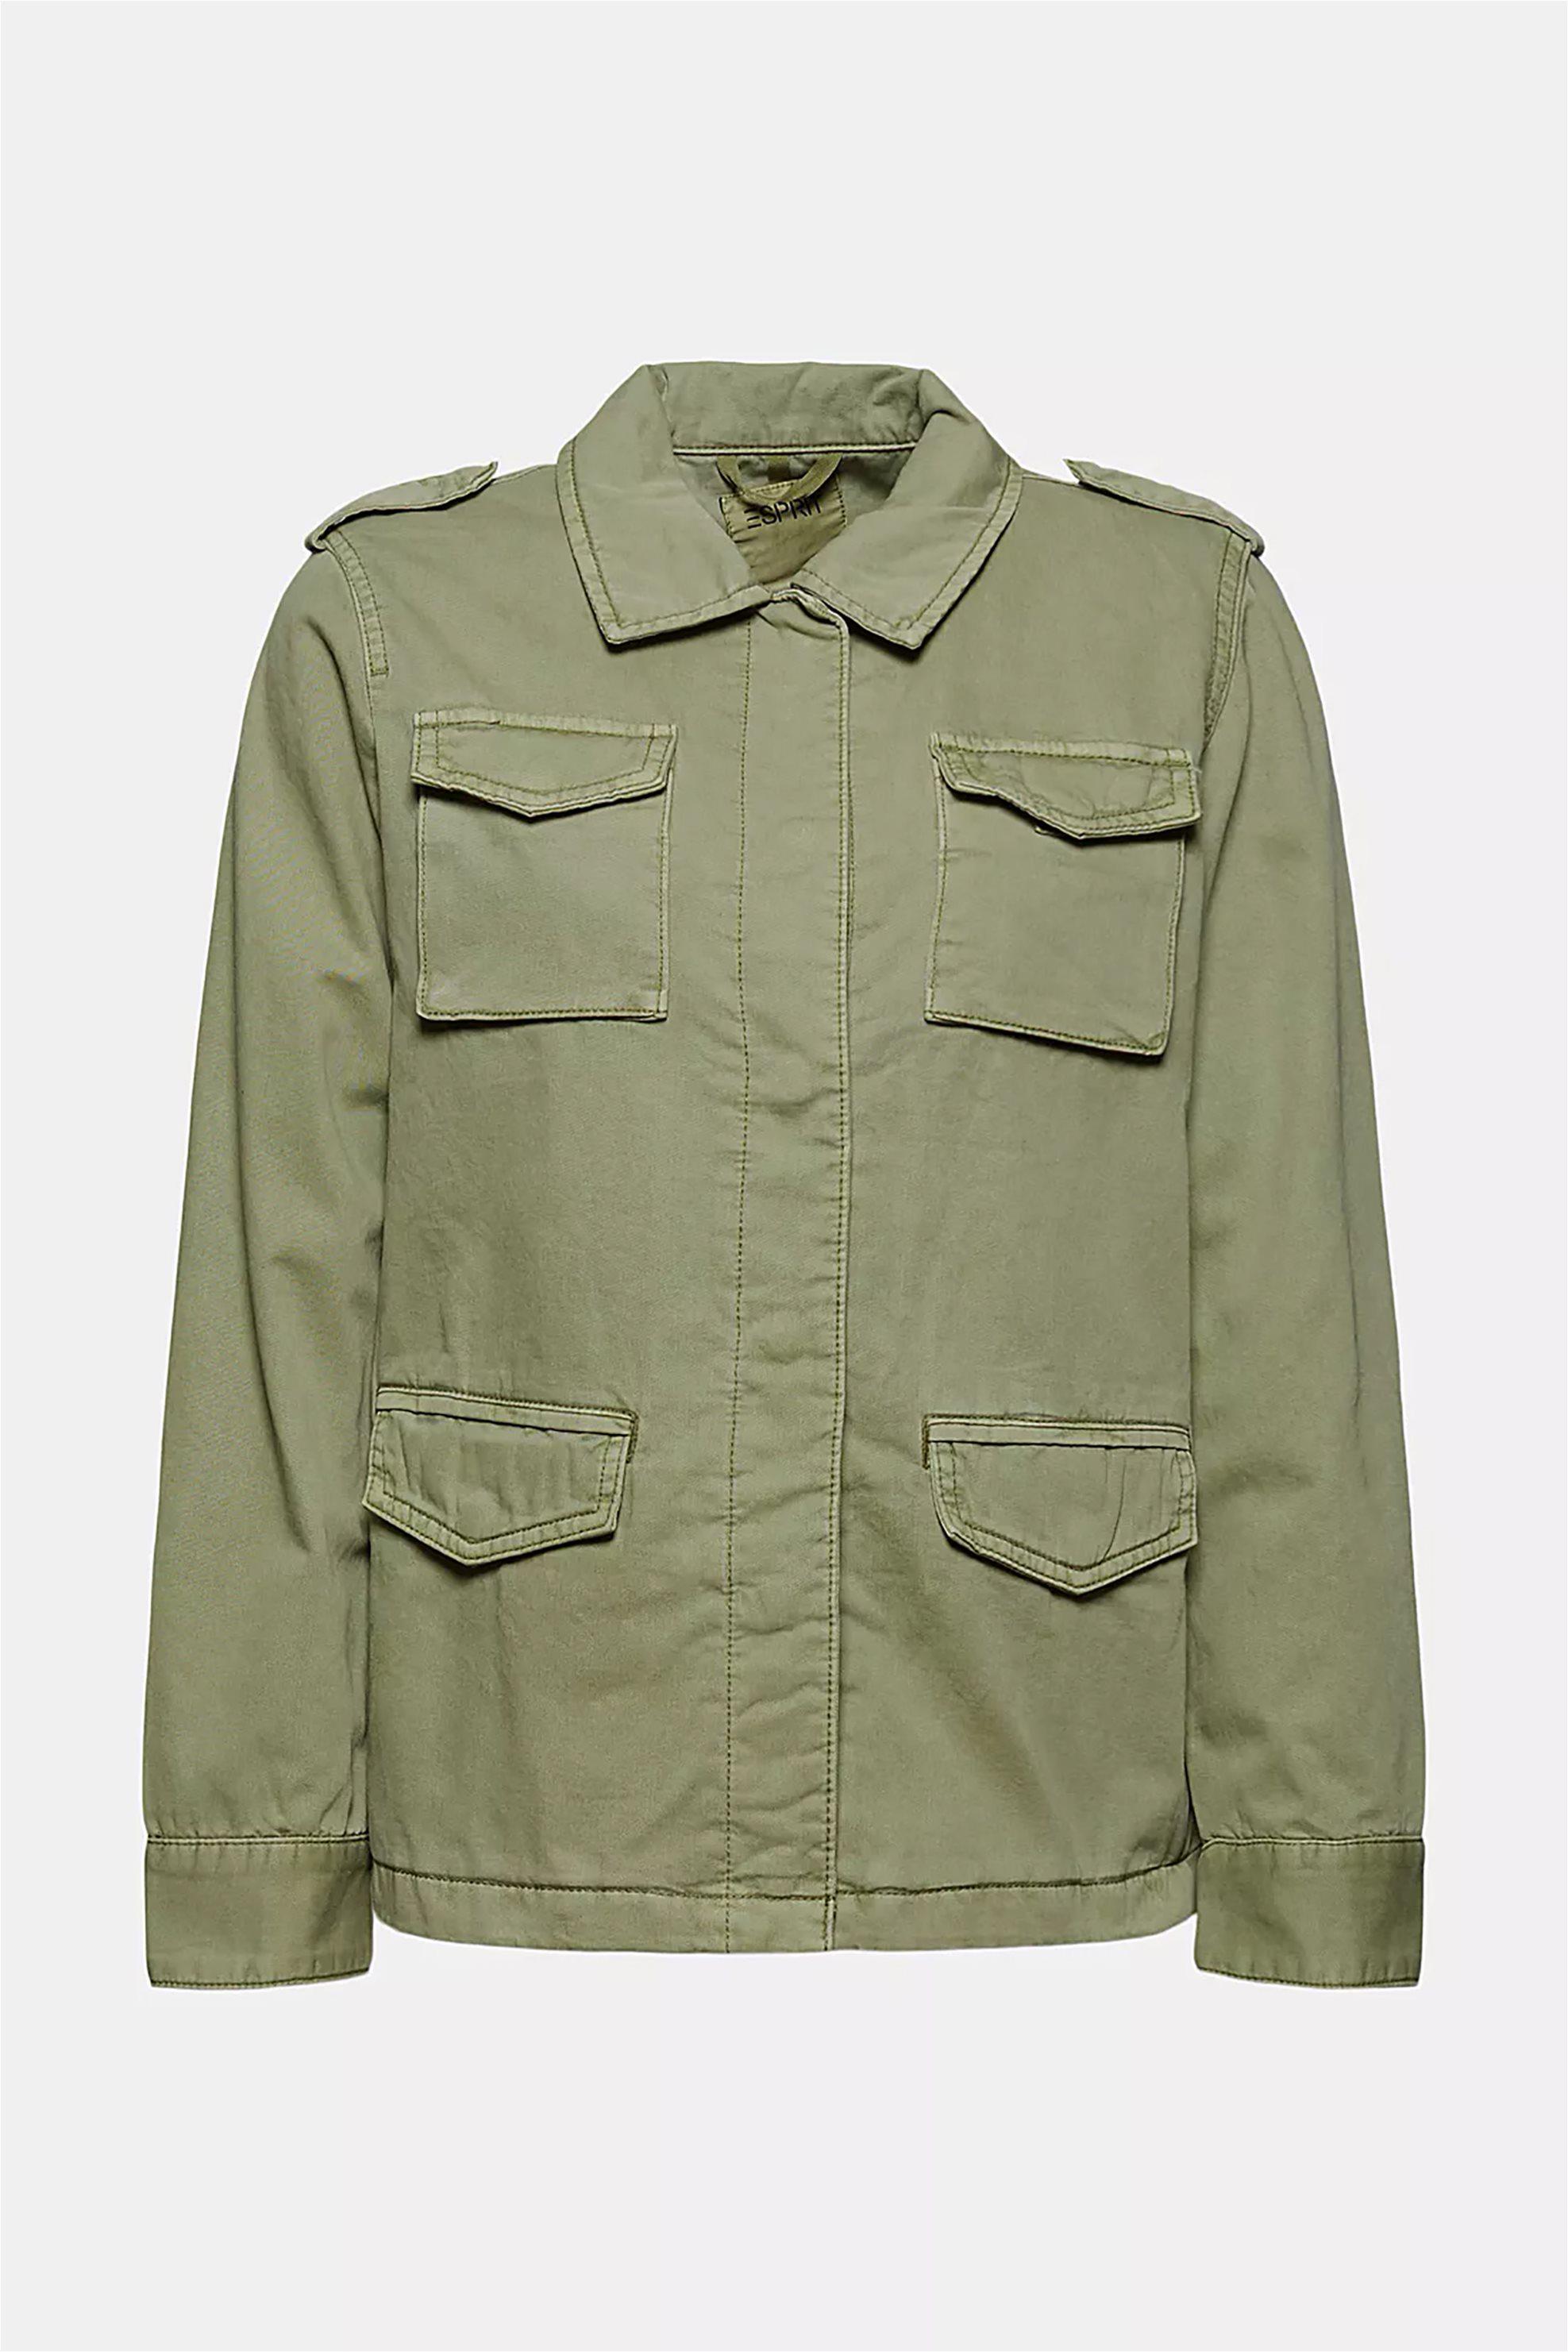 Esprit γυναικείο jacket μονόχρωμο με flap τσέπες - 021EE1G318 - Λαδί